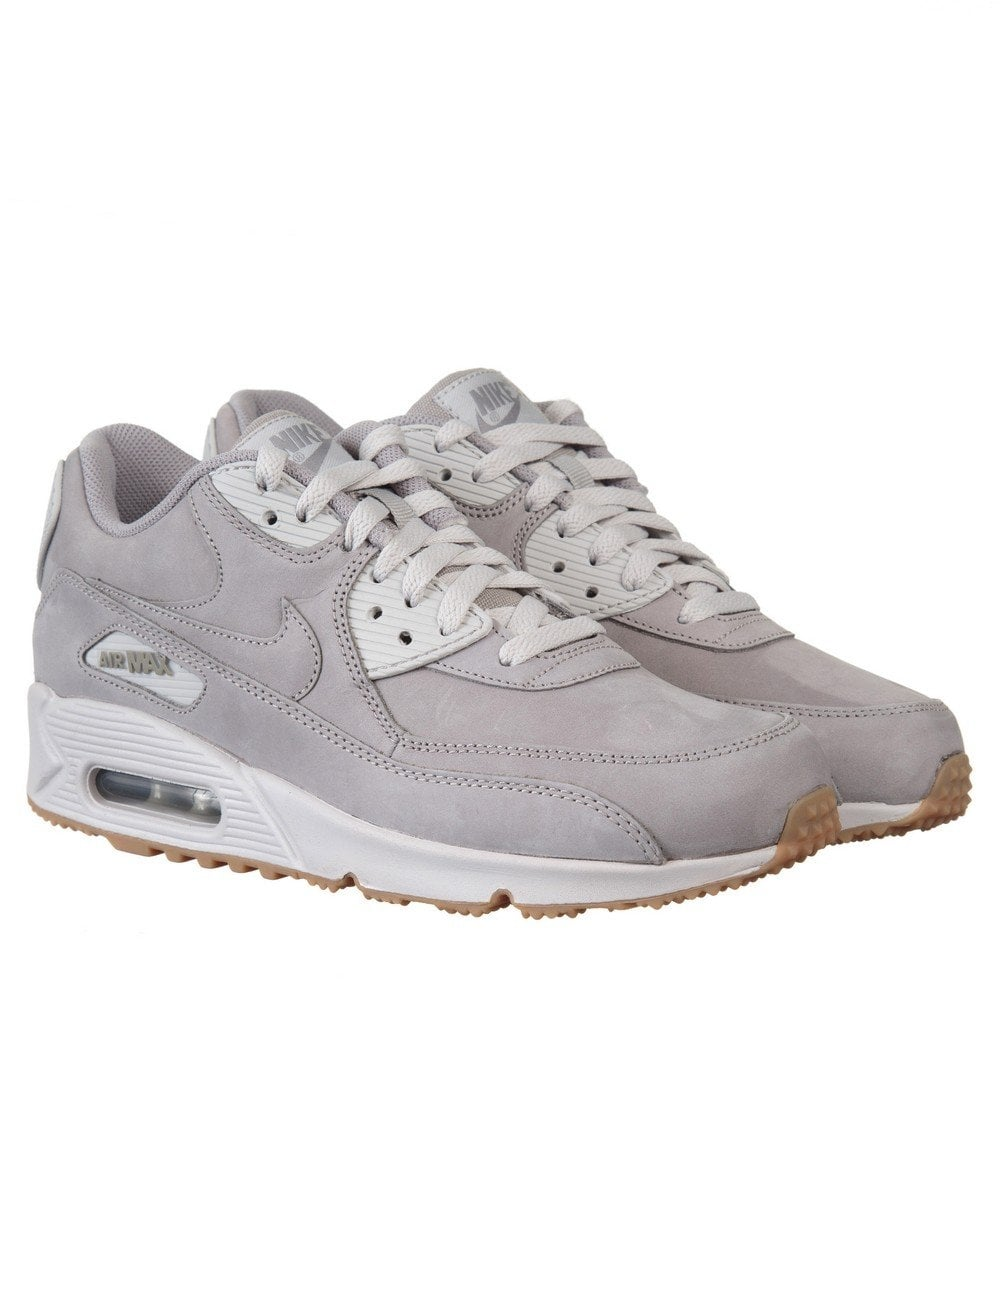 Air Max 90 Ltr Shoes Medium Grey (Winter Pack)